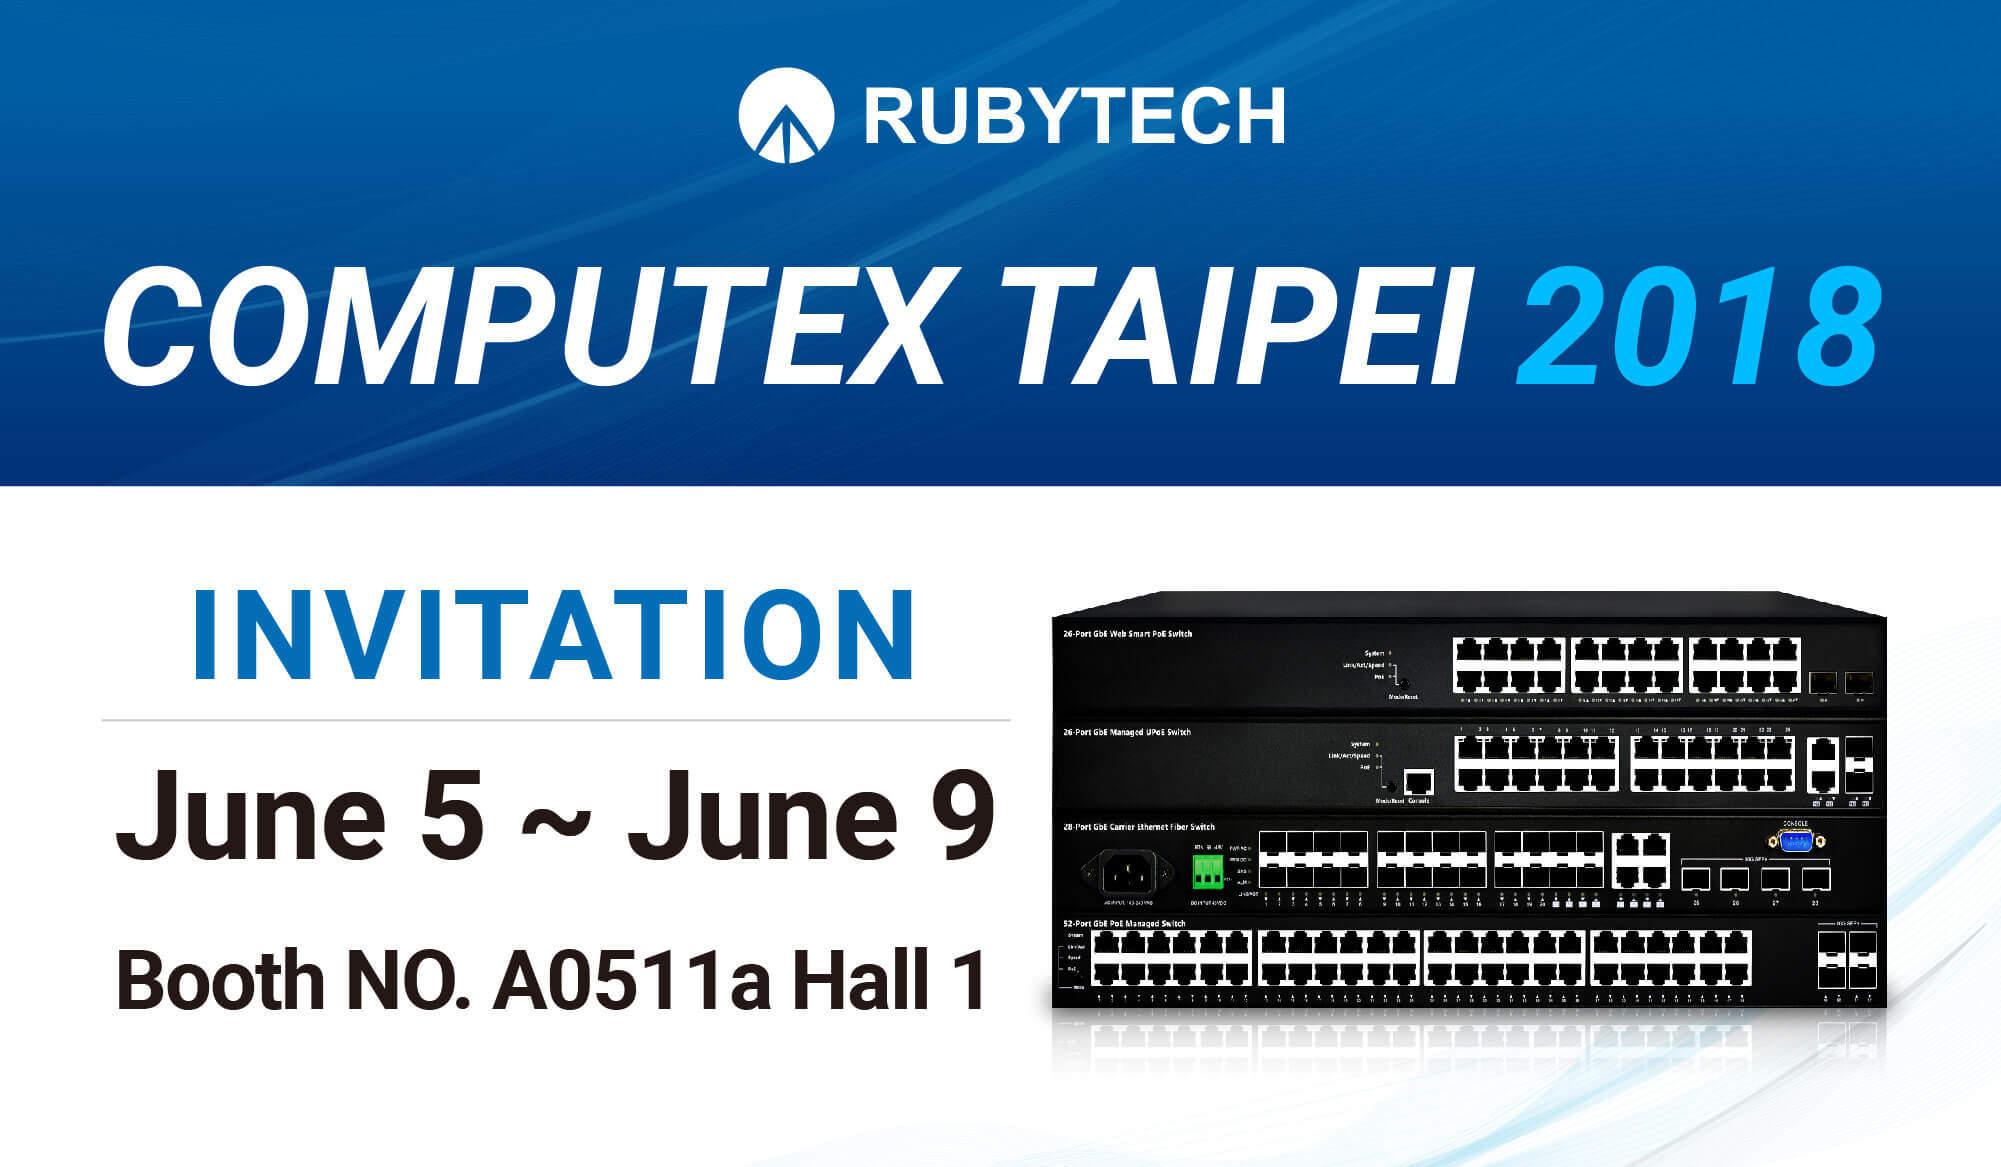 Computex-Taipei-2018-invitation